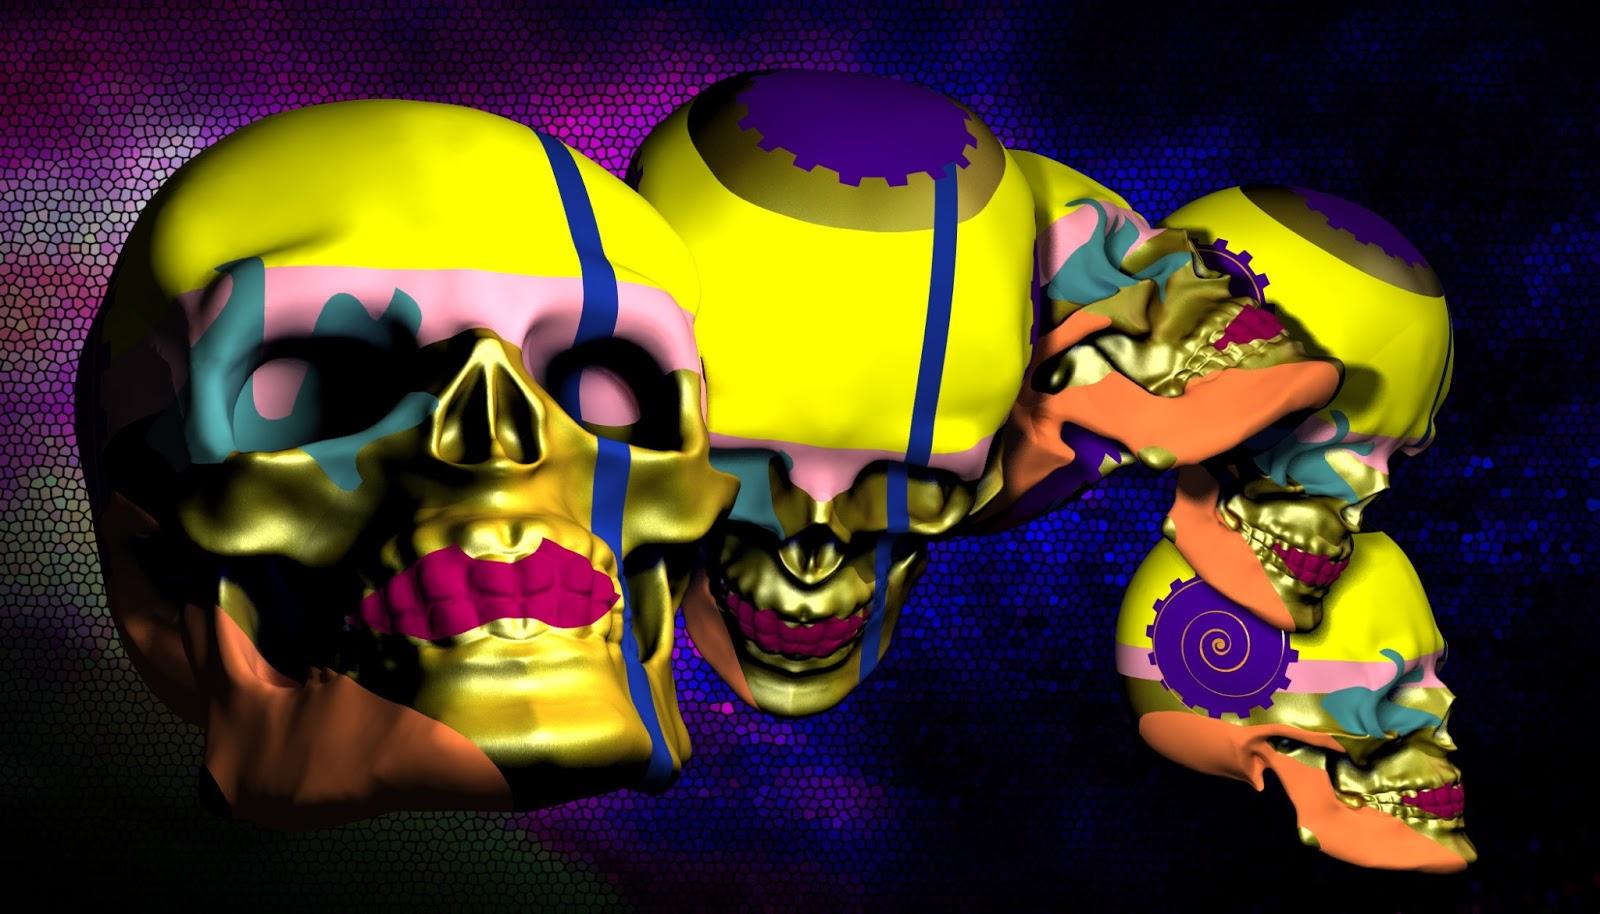 Wallpaper Smartphone 3d Sfondi Per Desktop Teschi Wallpapers Skull